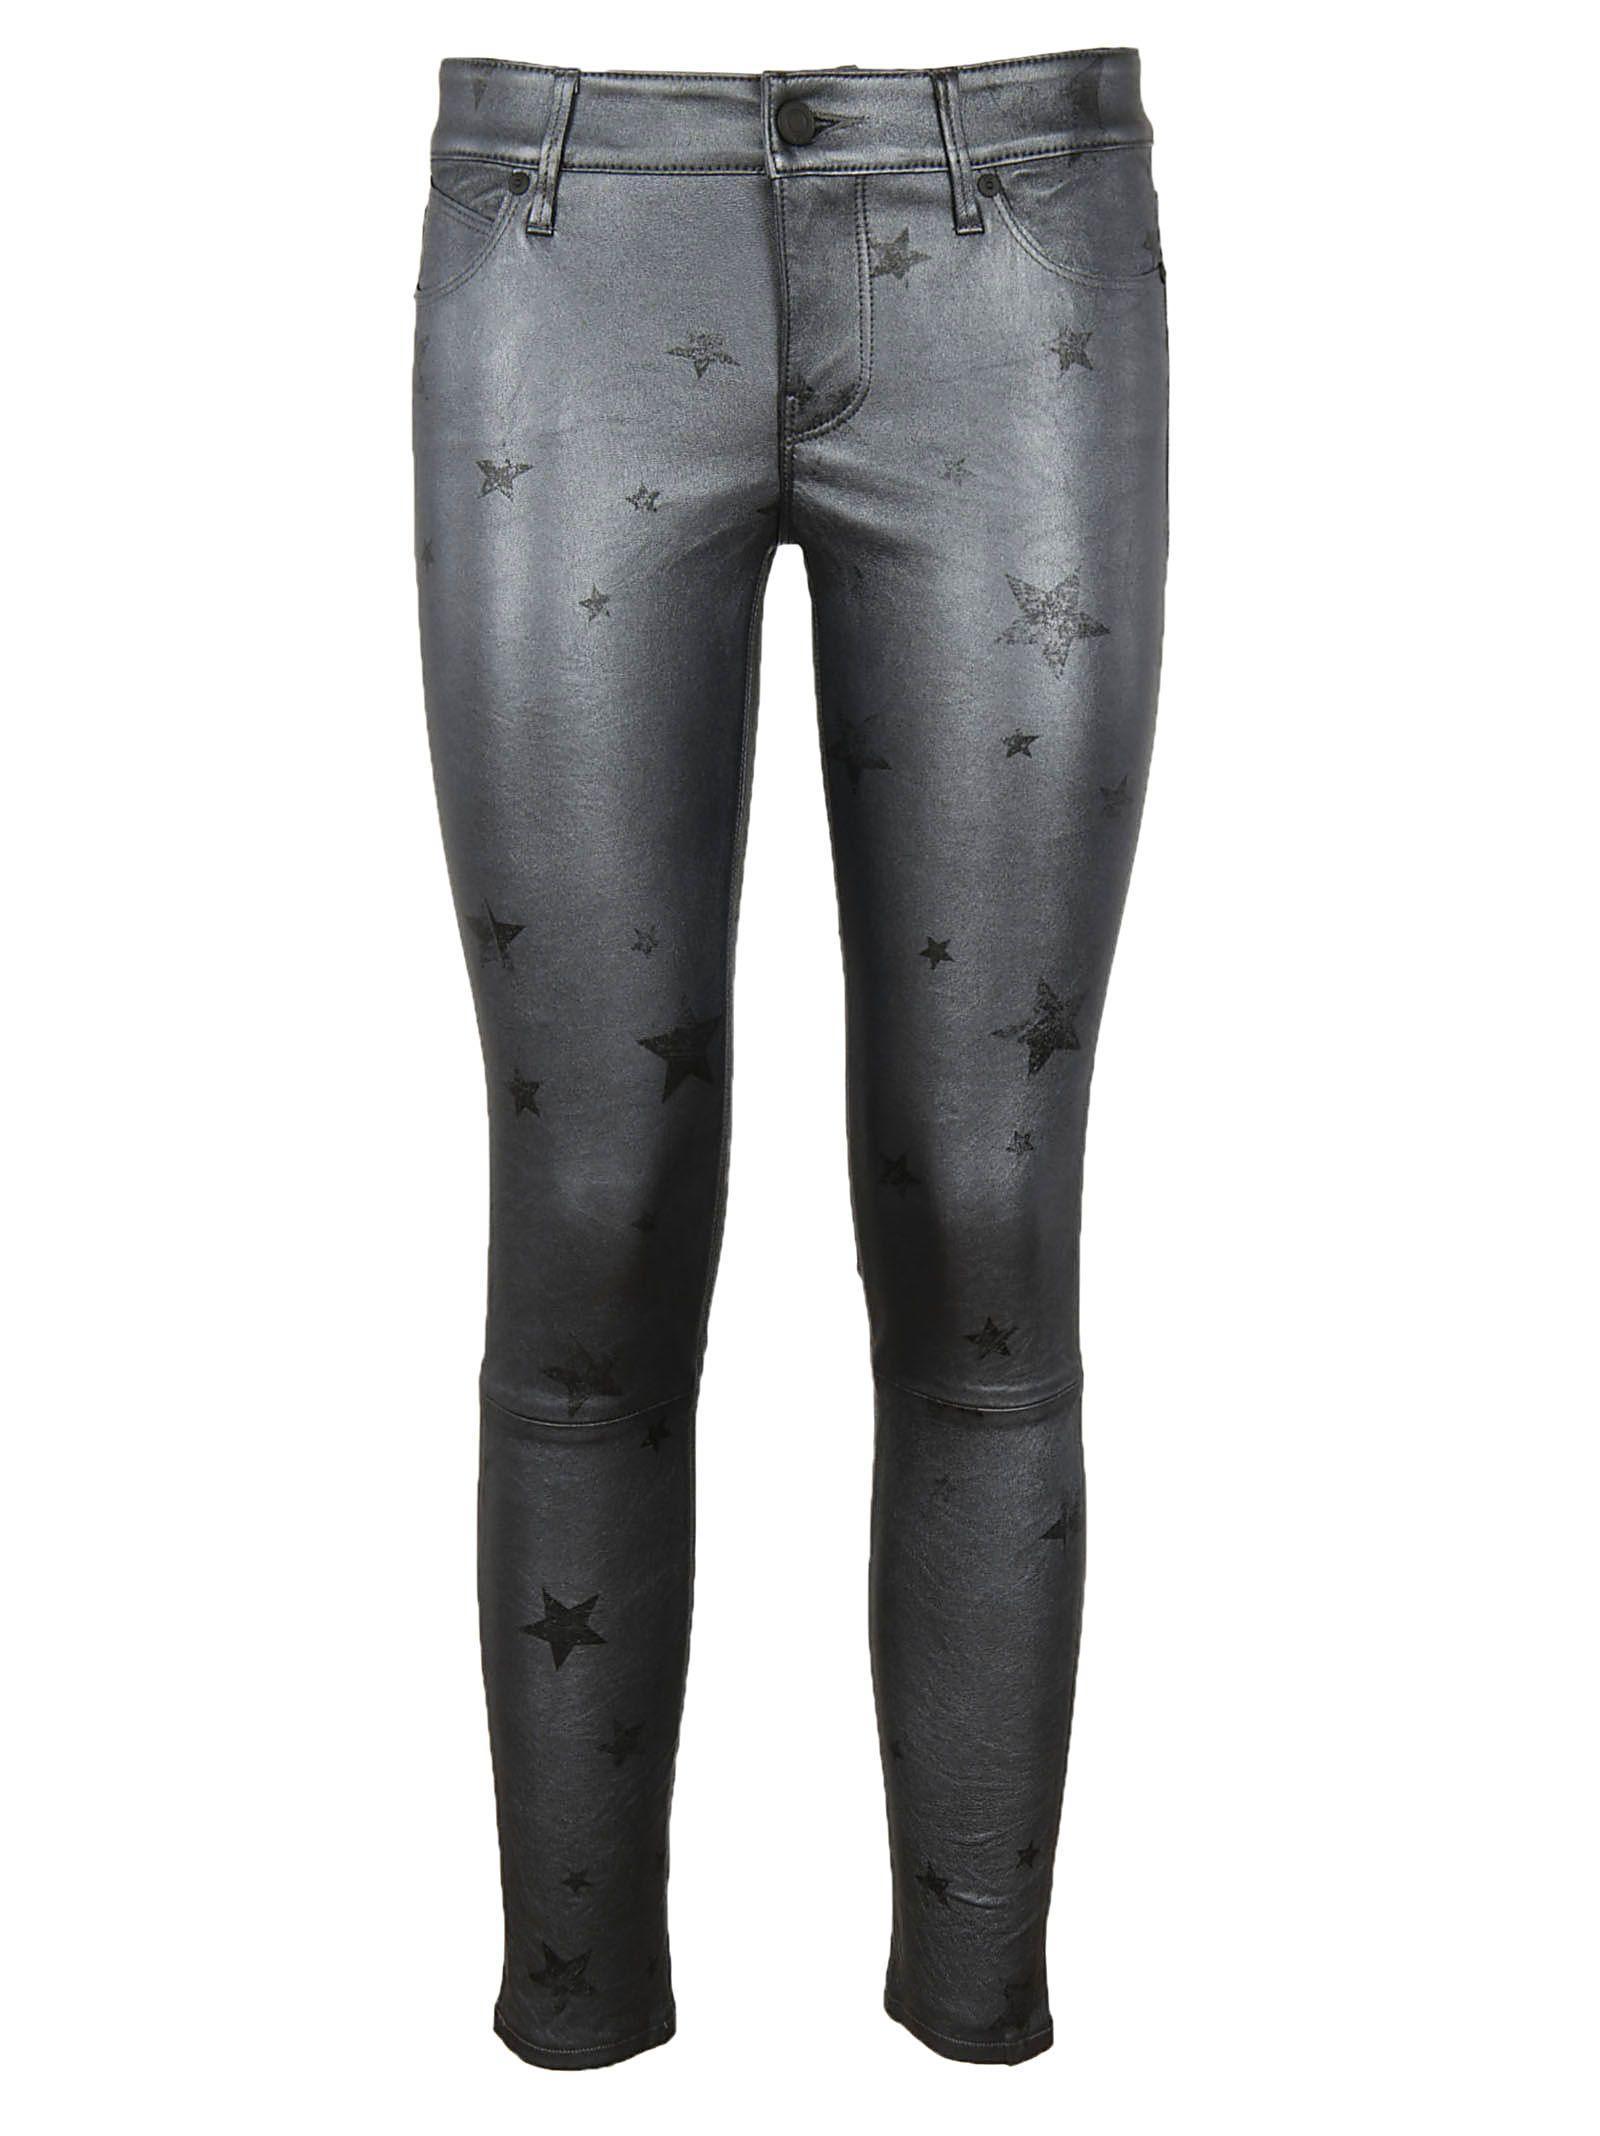 Rta Star Print Trousers In Black